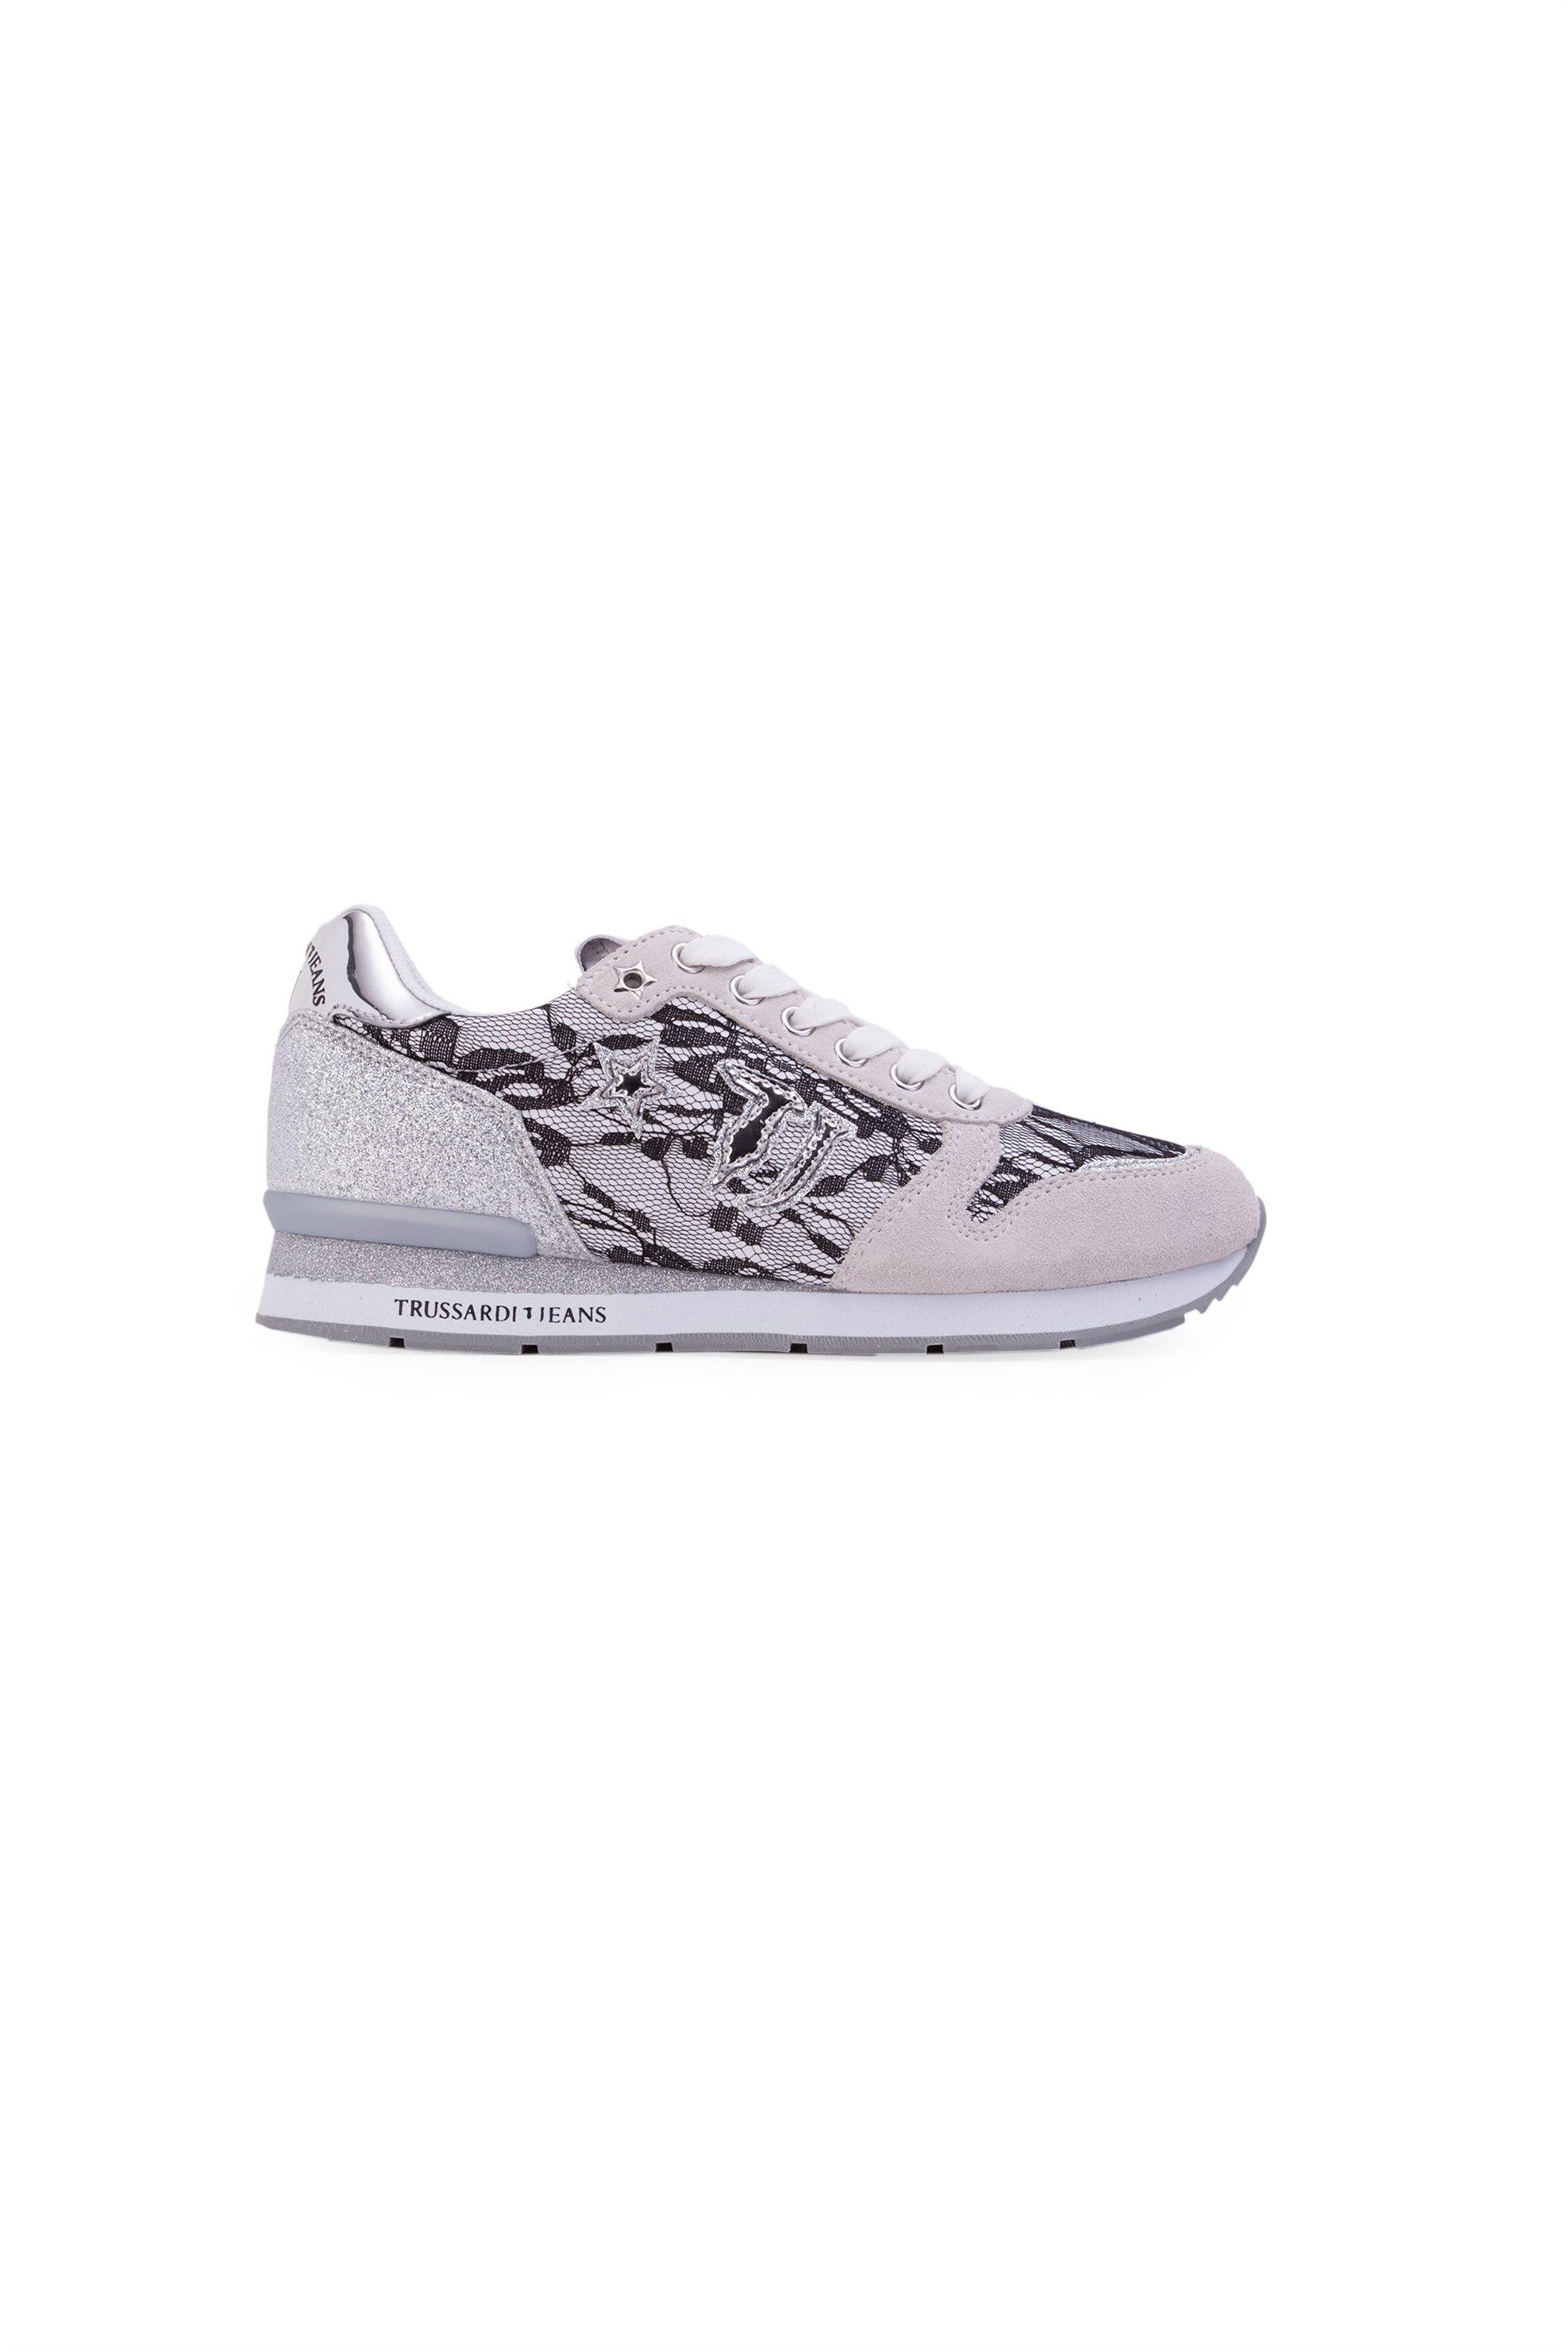 Notos Γυναικεία παπούτσια με δαντέλα Τrussardi – 79A00145-9Y099999 – Γκρι a8908a123b9